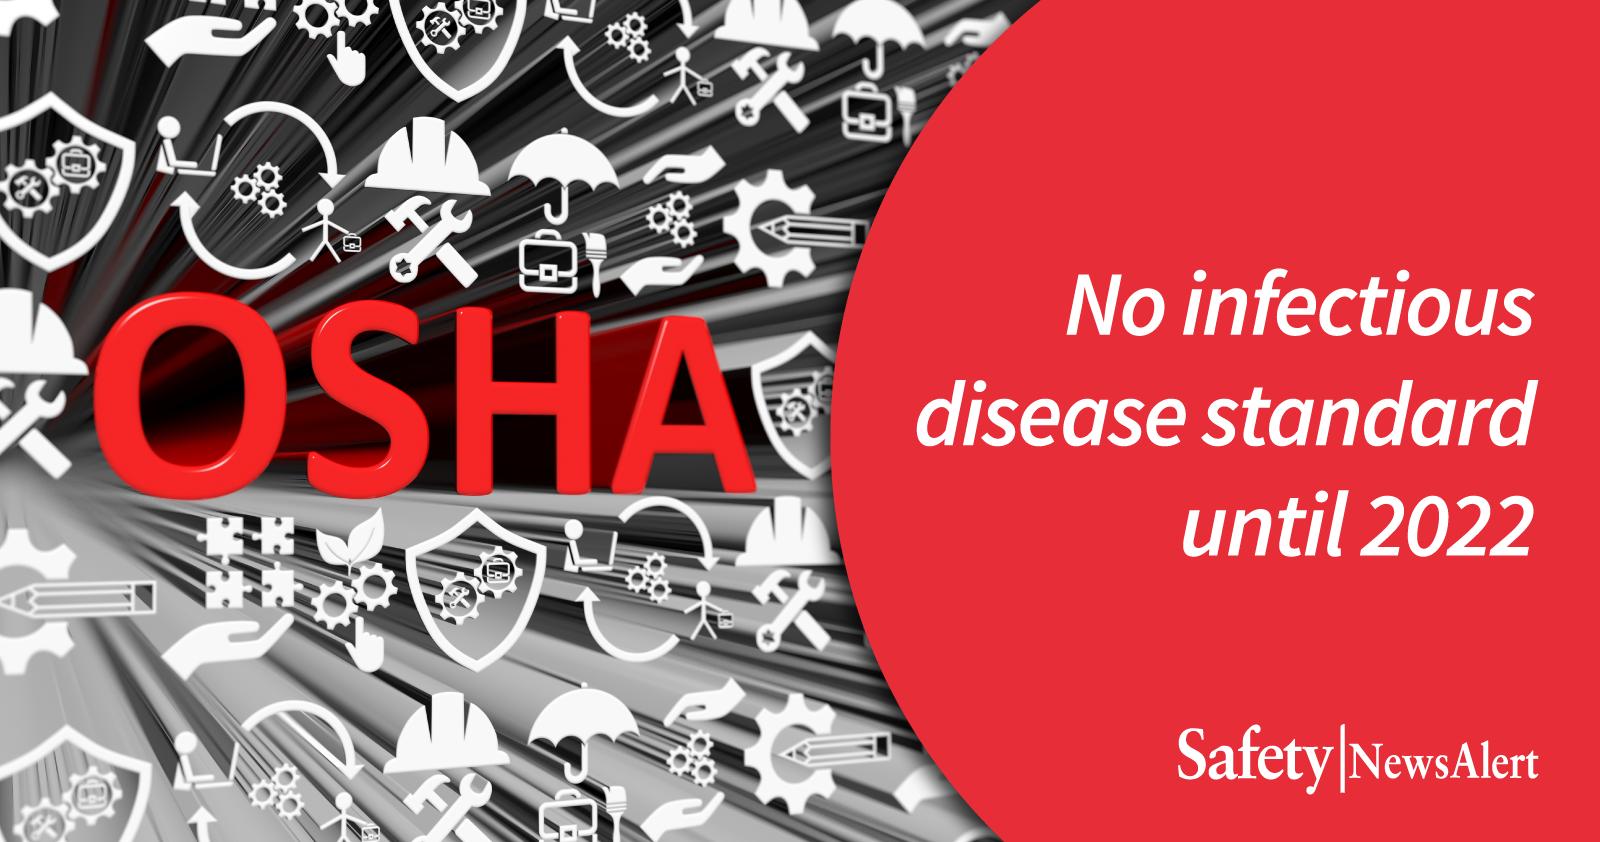 no infectious disease standard until 2022